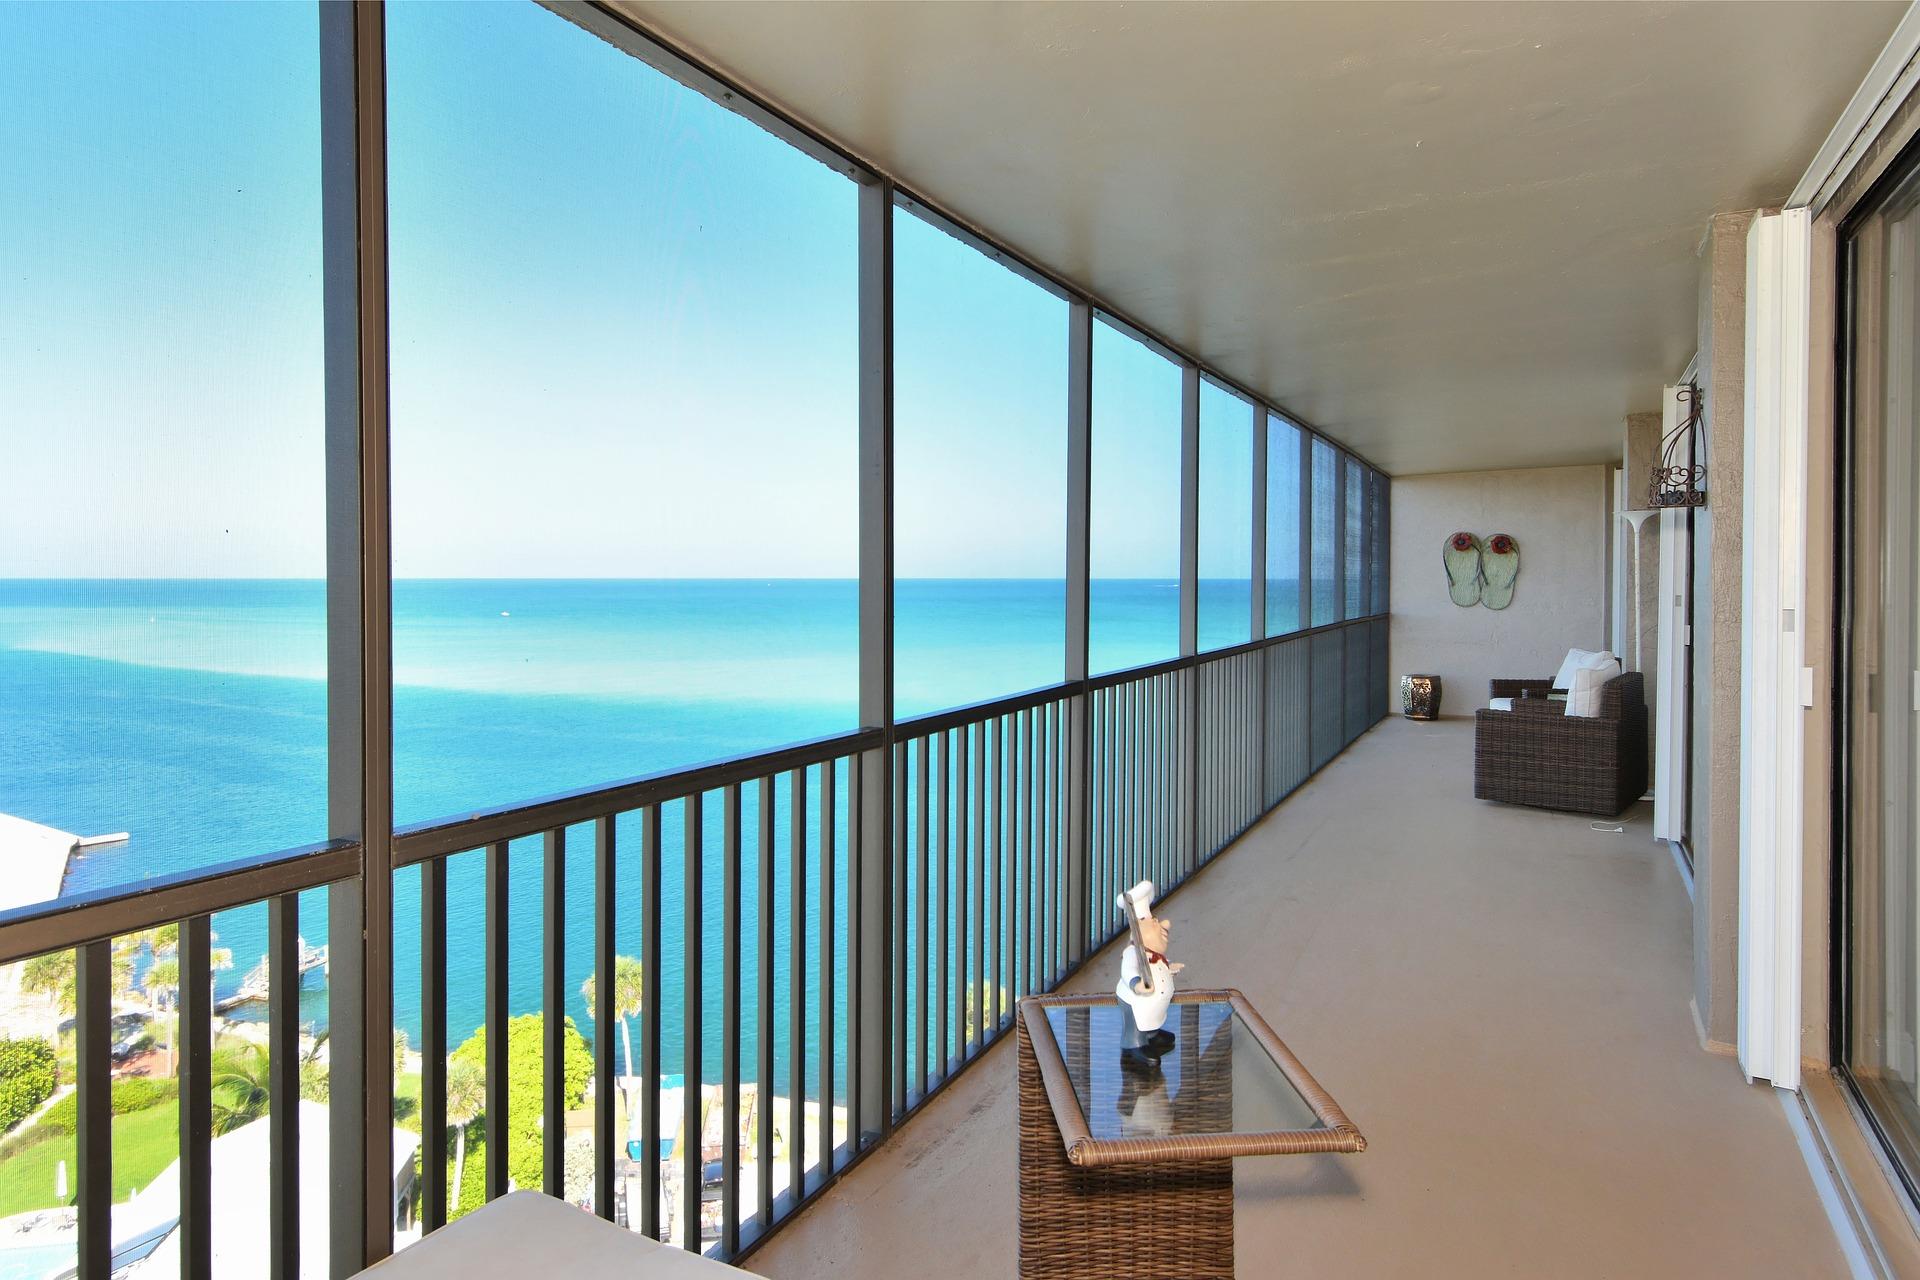 Balcony Ceiling Mount Occupancy Sensor